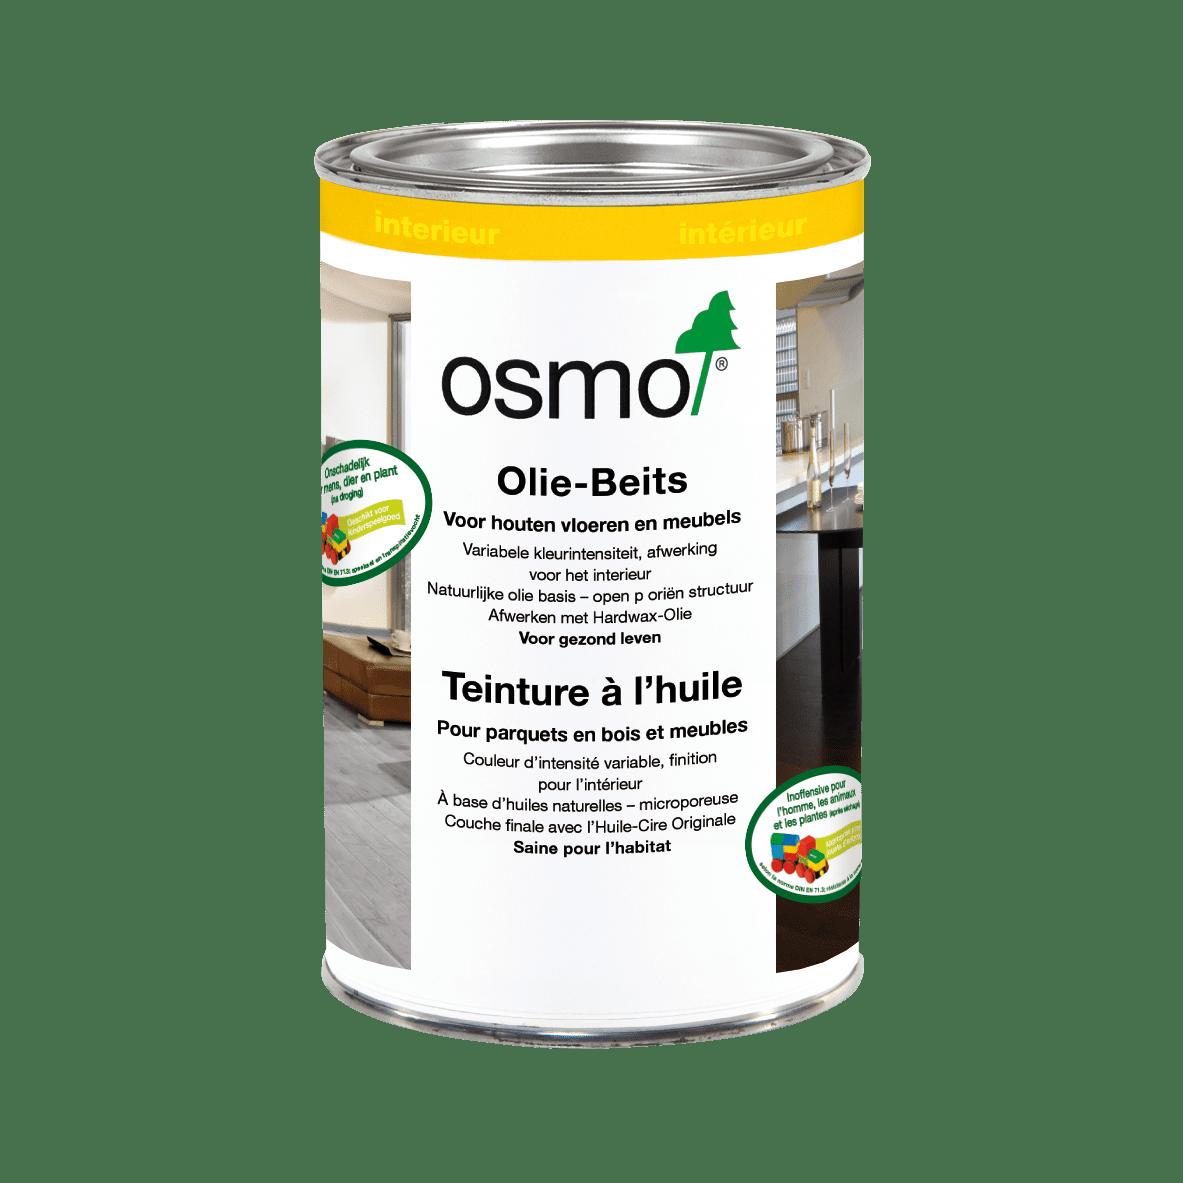 Osmo Olie-Beits Blik